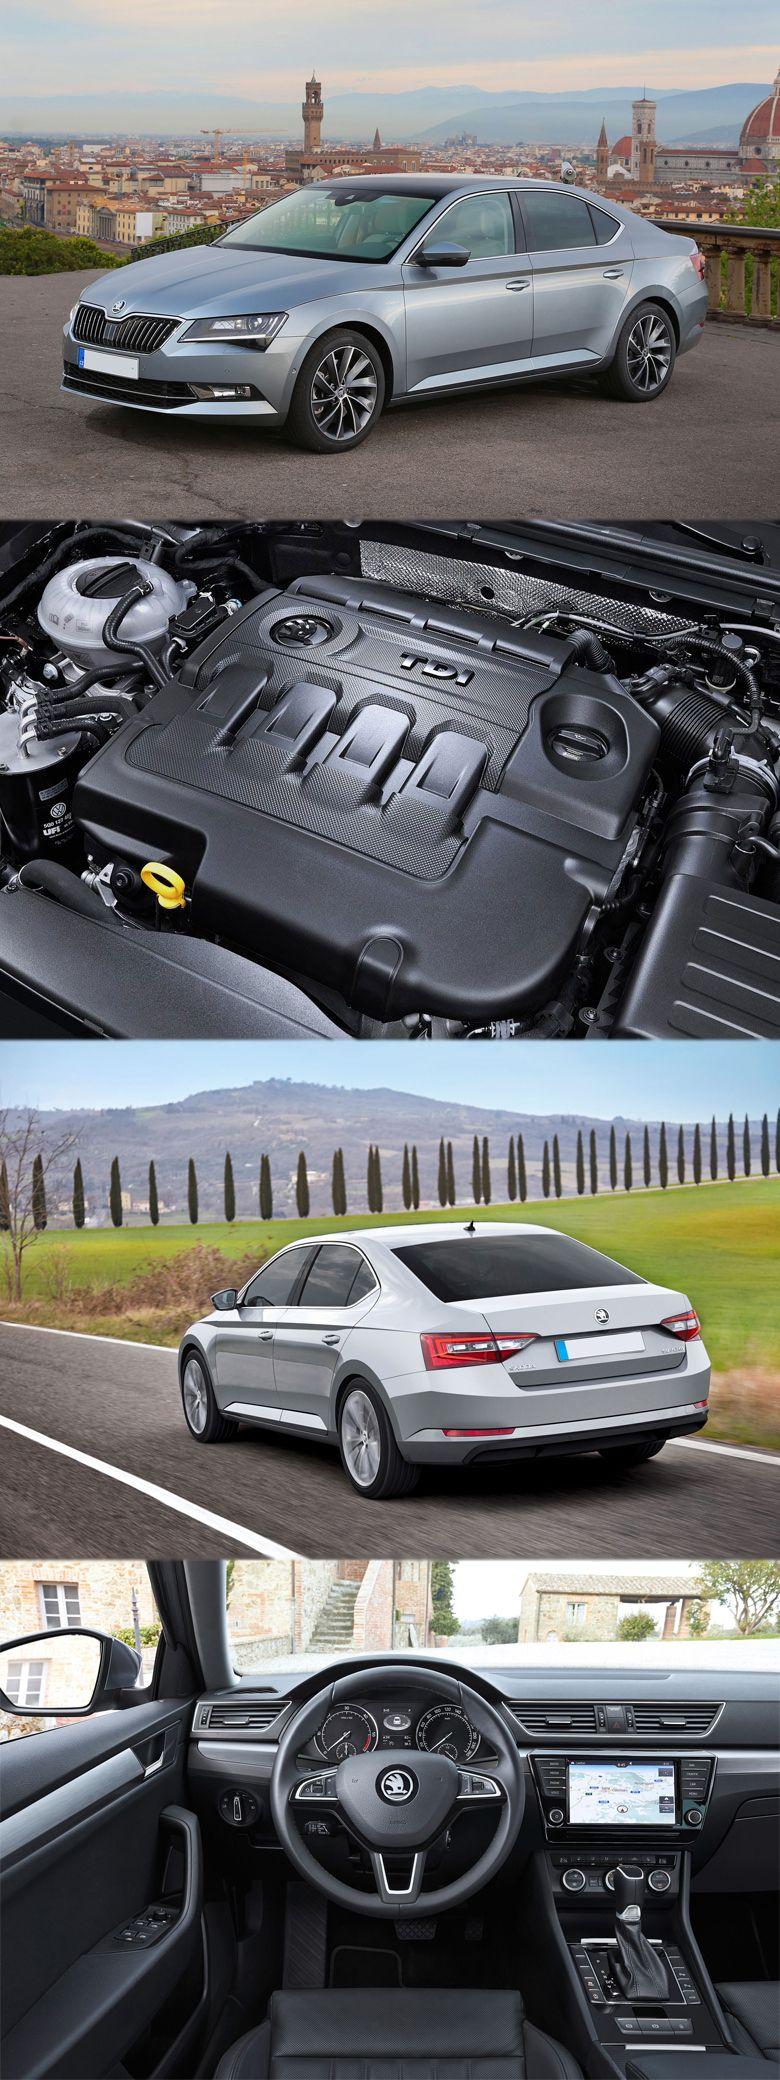 Category Skoda >> Skoda Superb Is Fabulous In Engine Performance Https Www